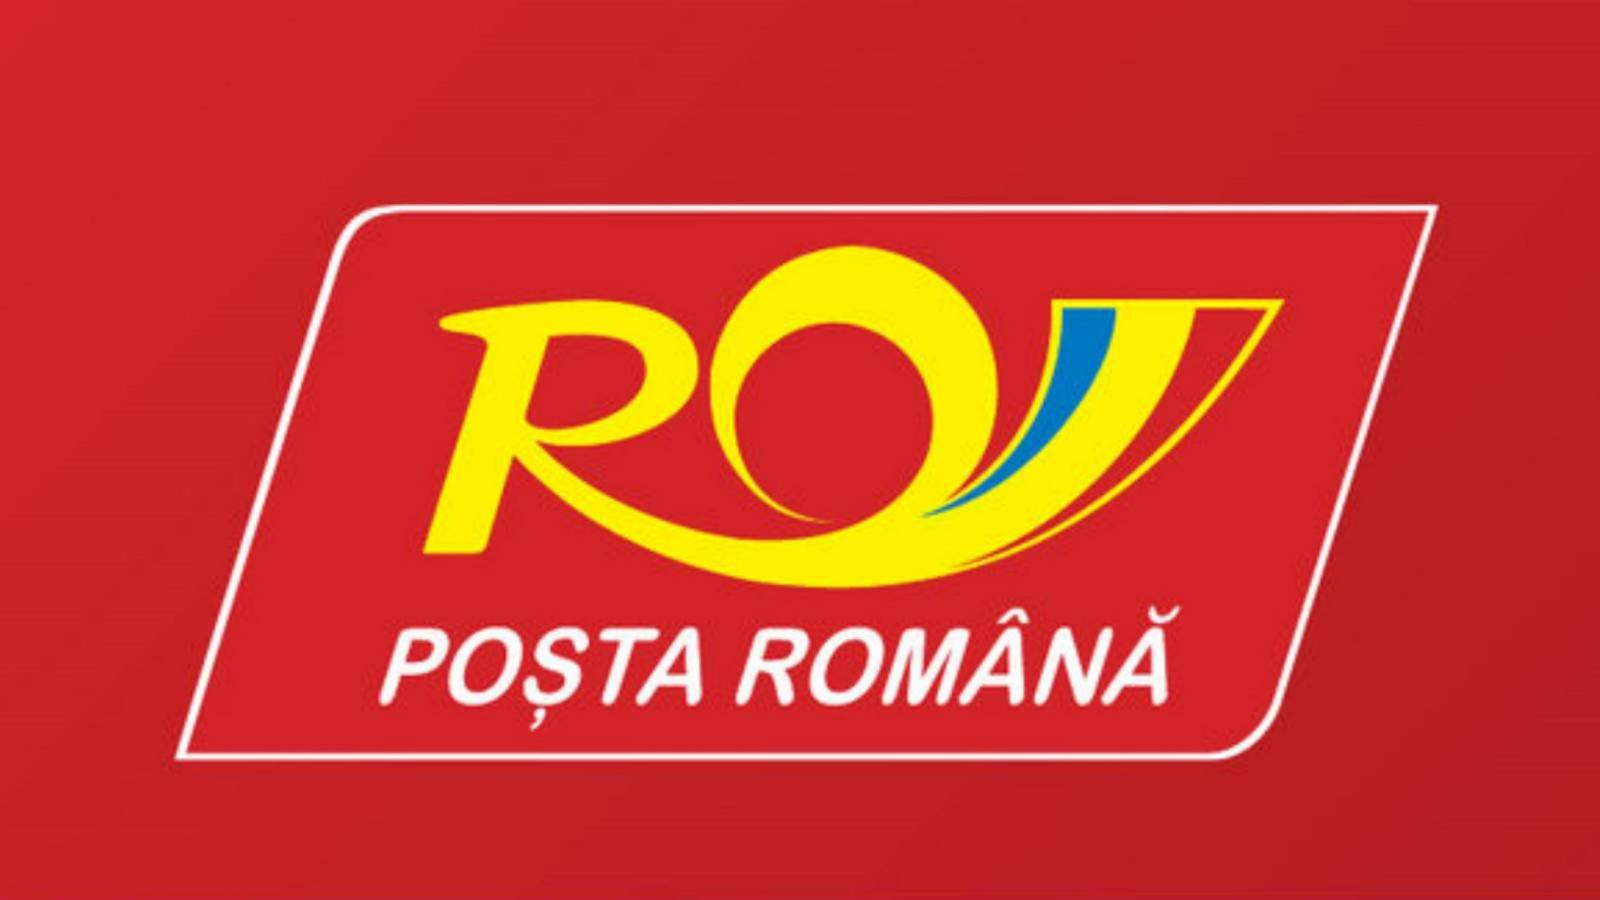 Posta Romana cutii oficii